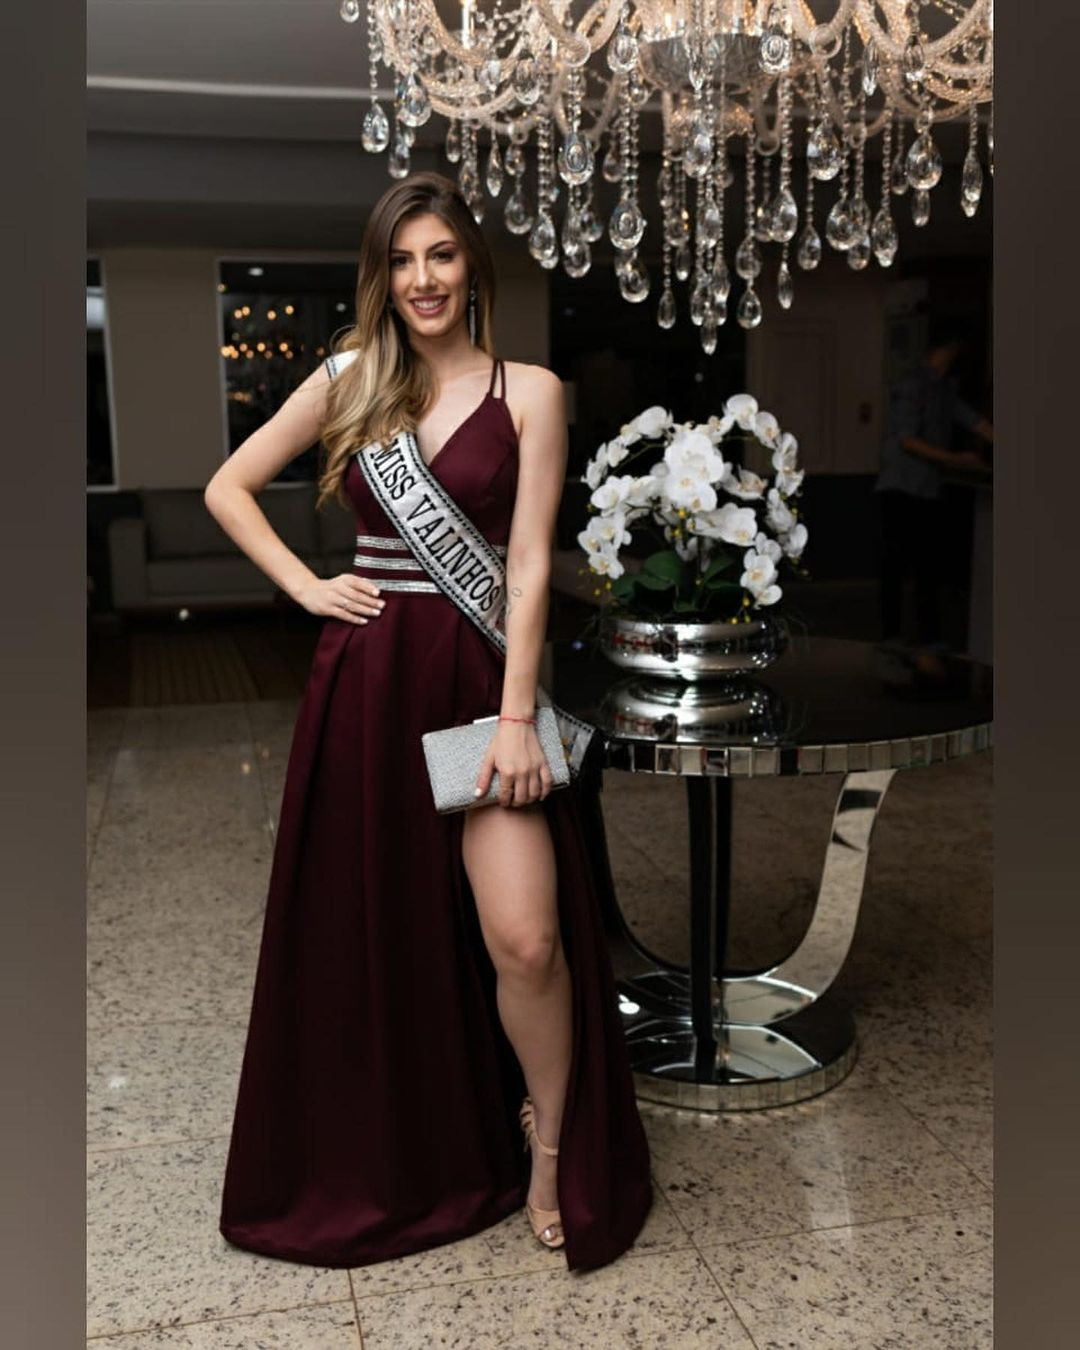 candidatas a miss sao paulo mundo 2022. - Página 2 BZydmJ